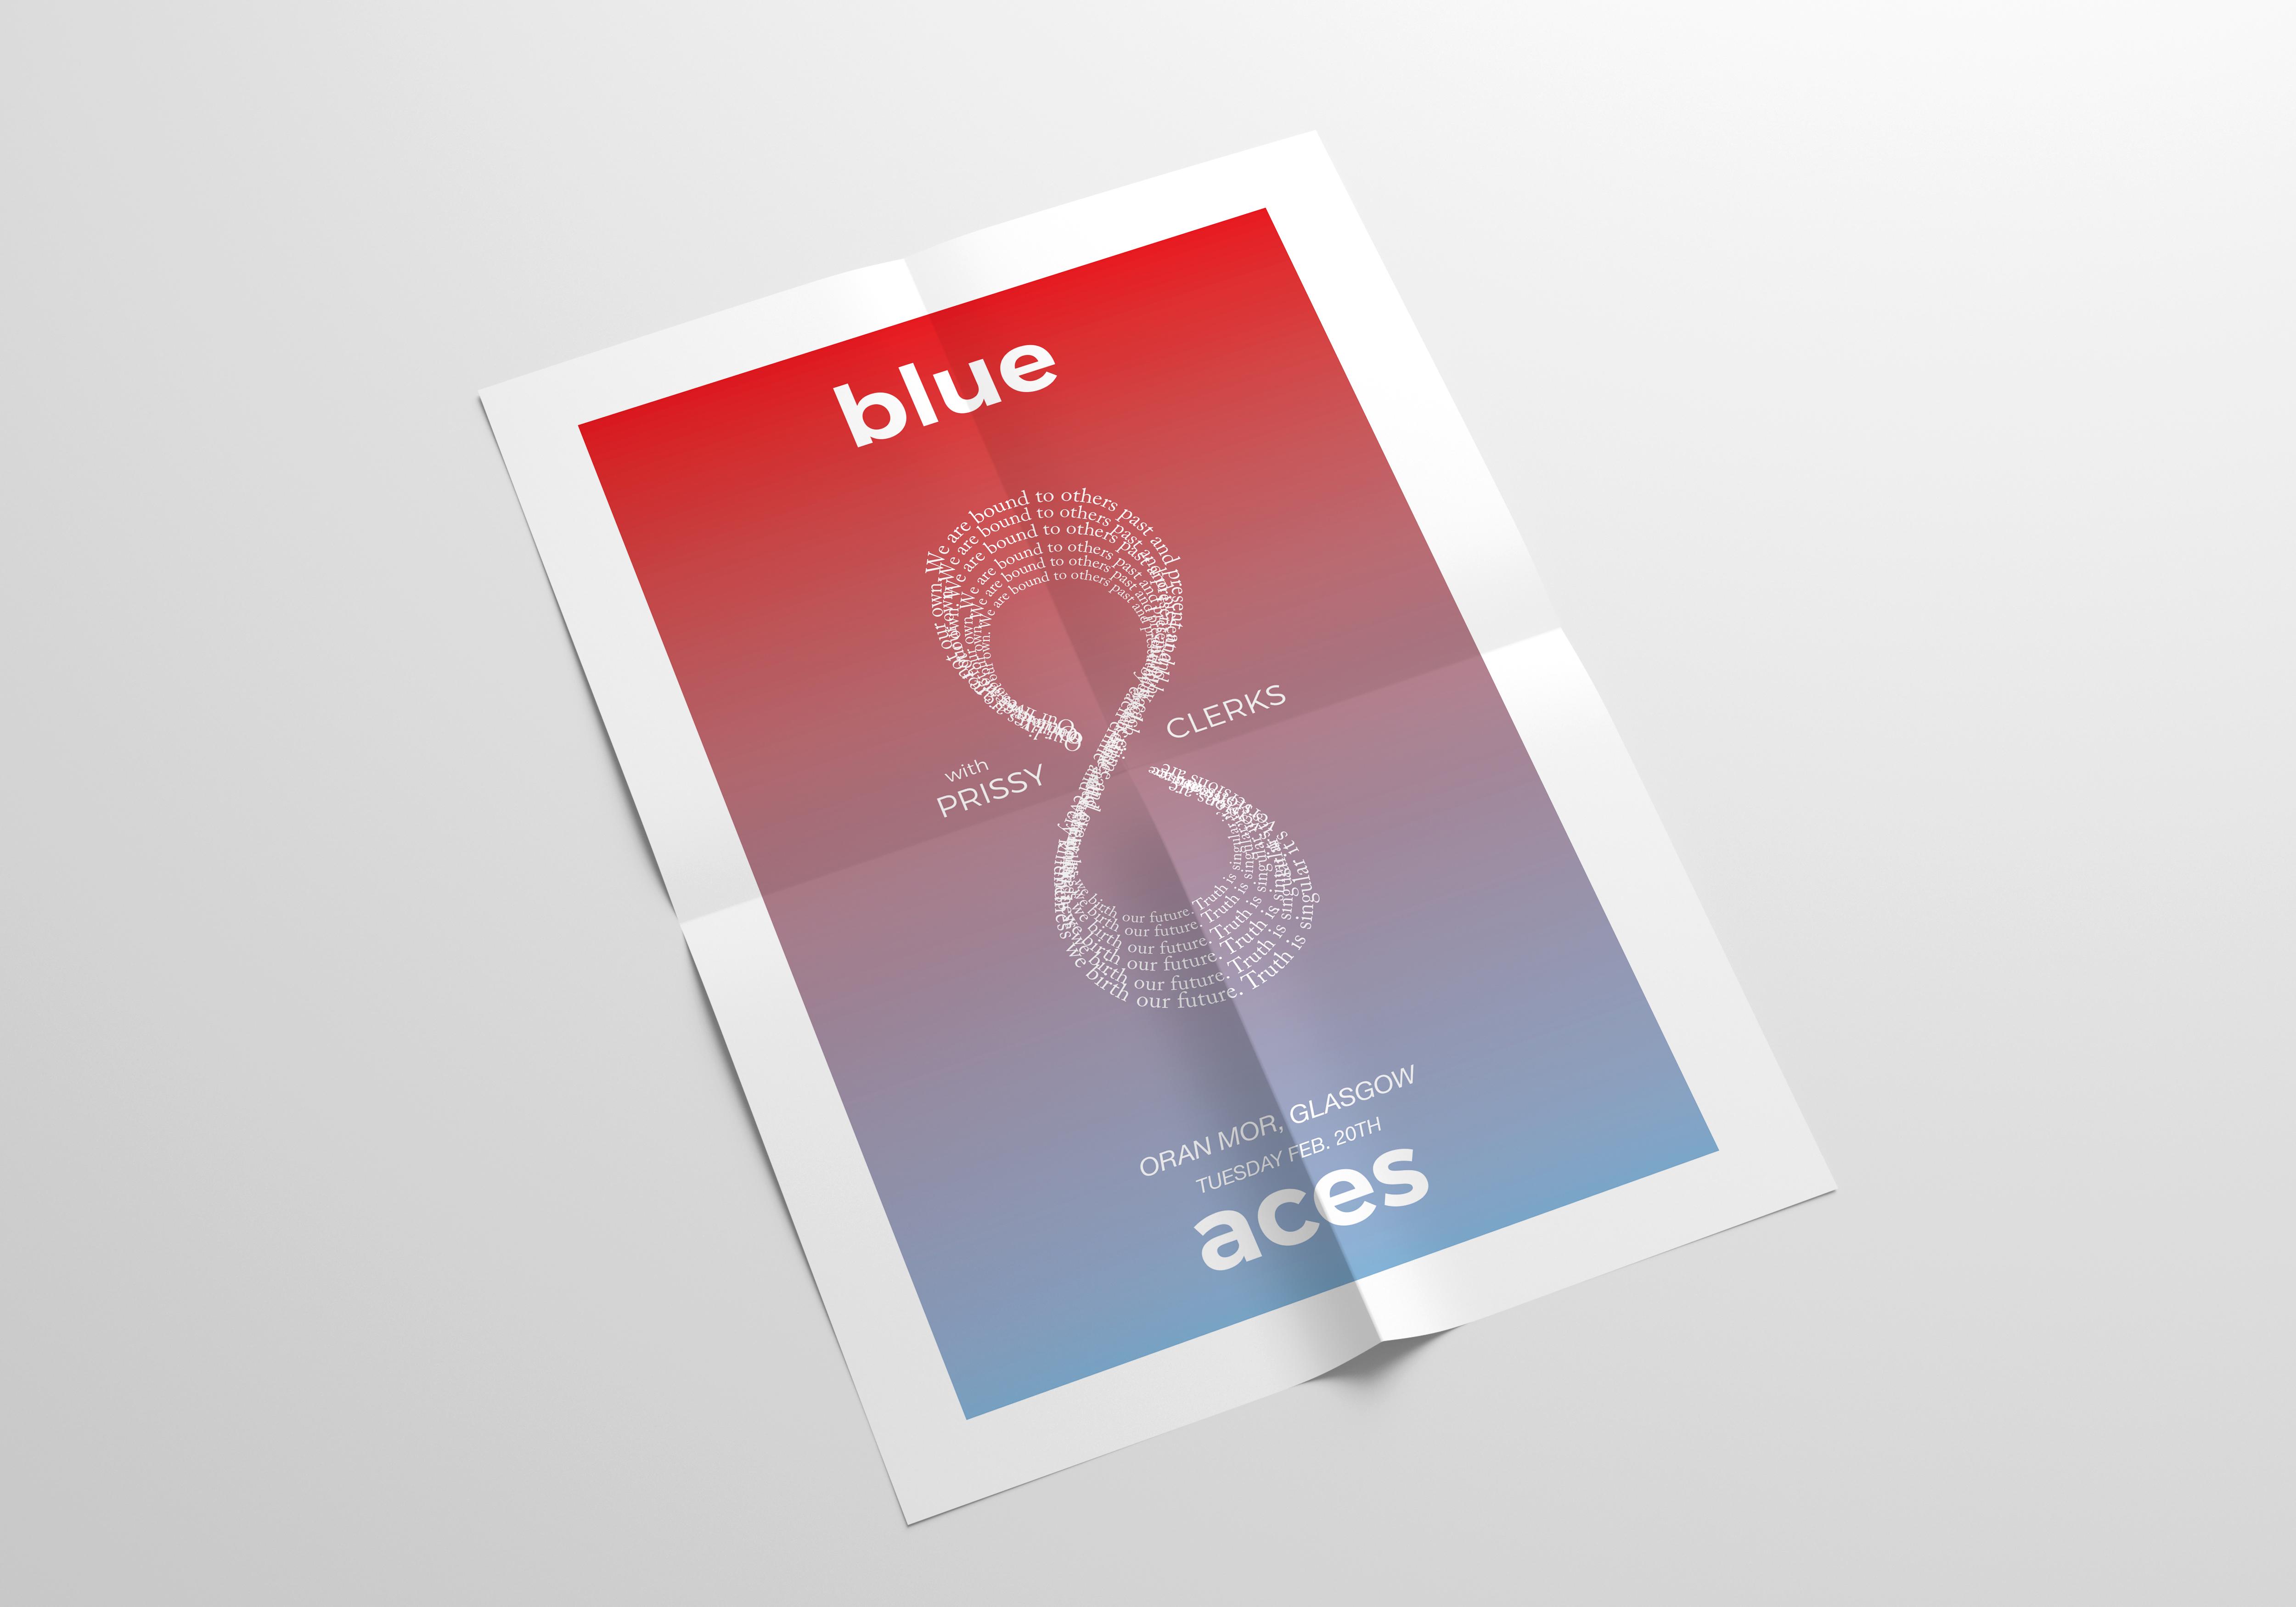 blue aces mock up